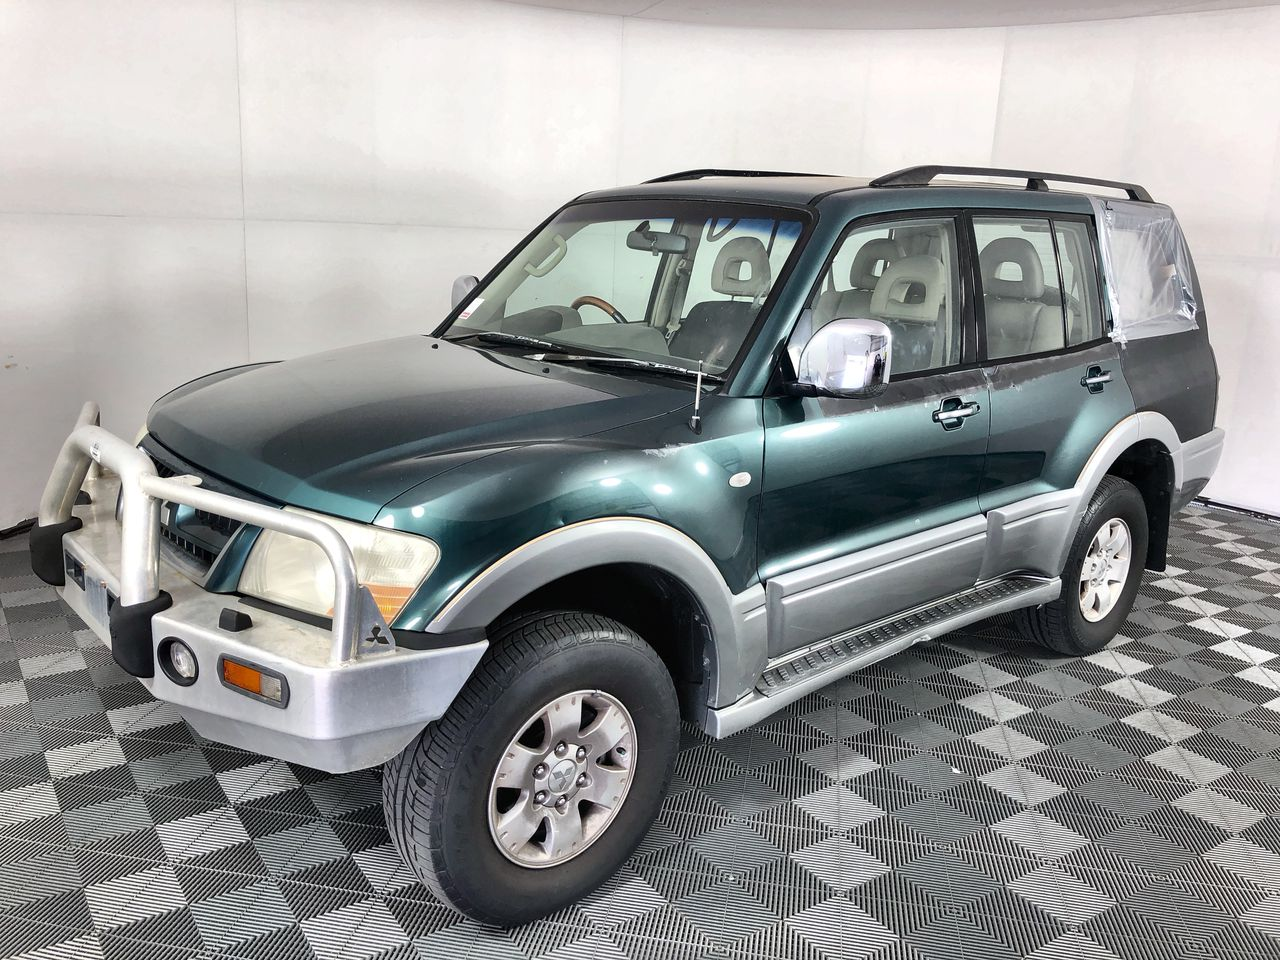 2003 Mitsubishi Pajero Exceed LWB (4x4) NP Automatic 7 Seats Wagon